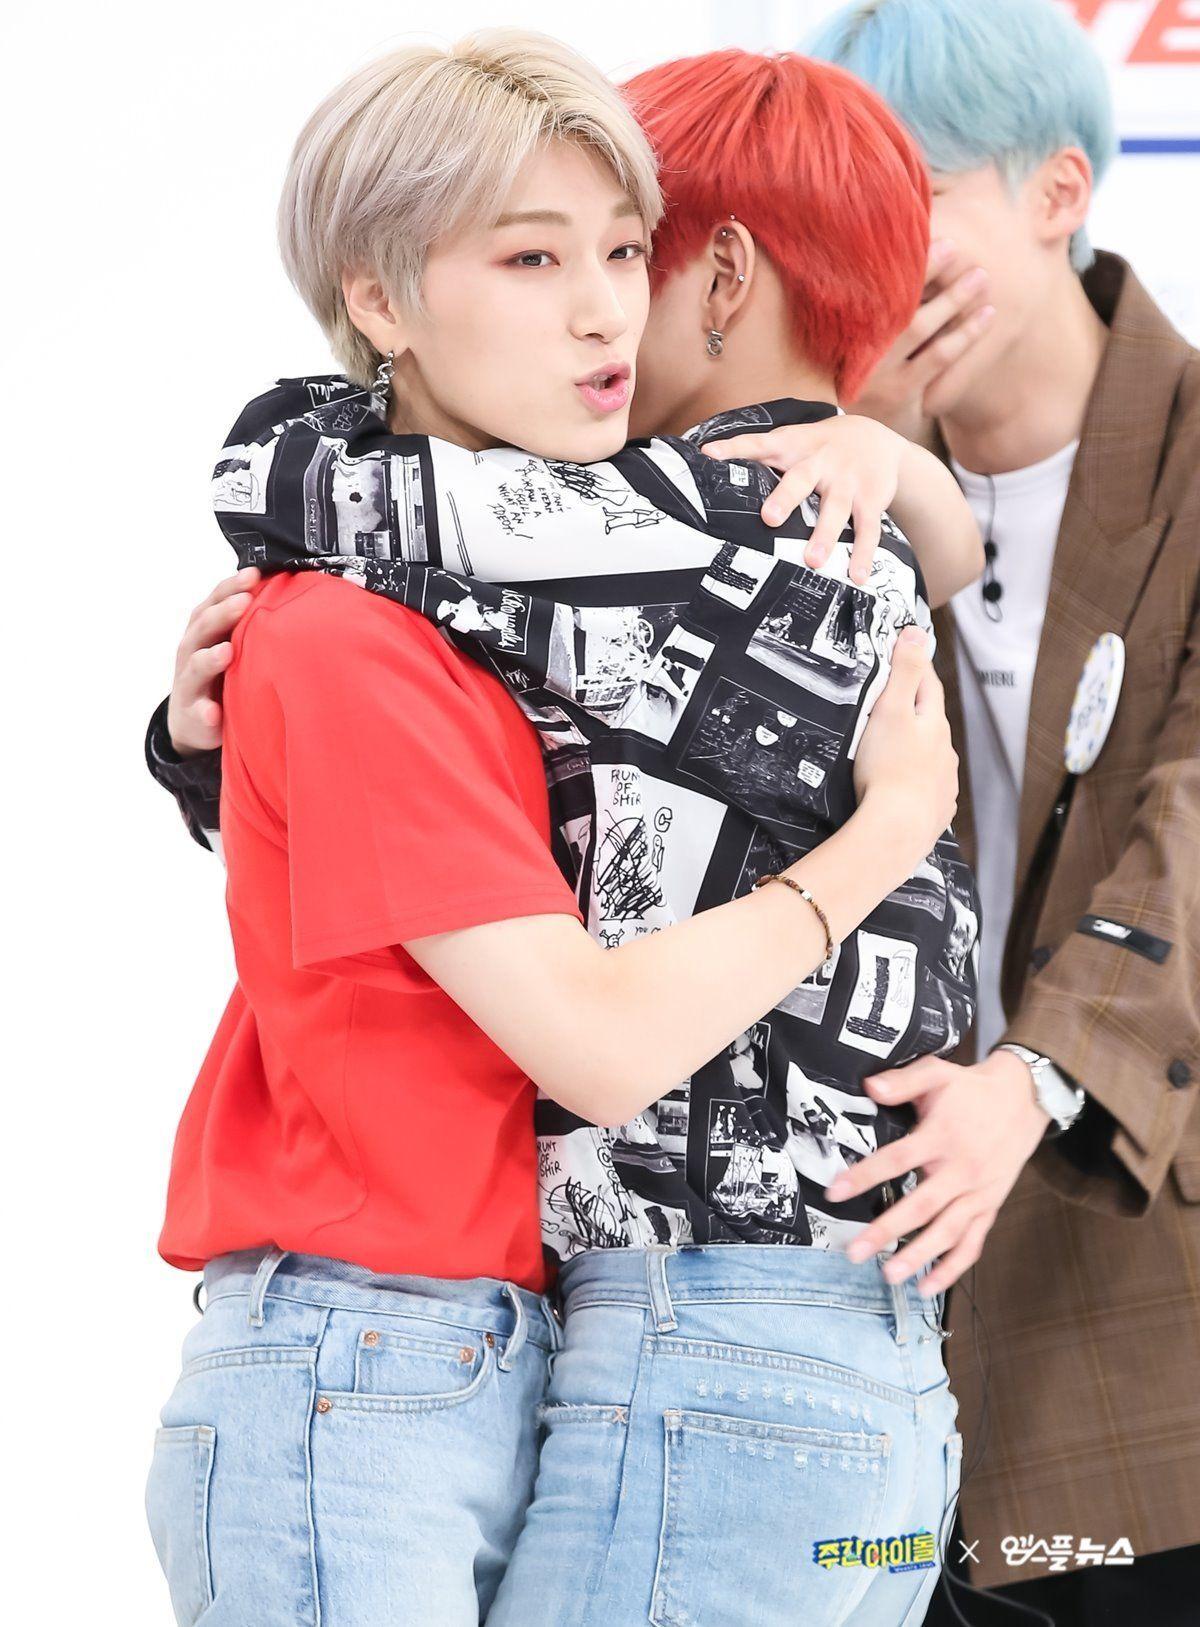 Ateez San Hongjoong Idol Weekly Idol Appearance Ateez Atiny Wooyoung San Seonghwa Hongjoong Mingi Yunho Jongho Woo Young Weekly Idol Latest Albums